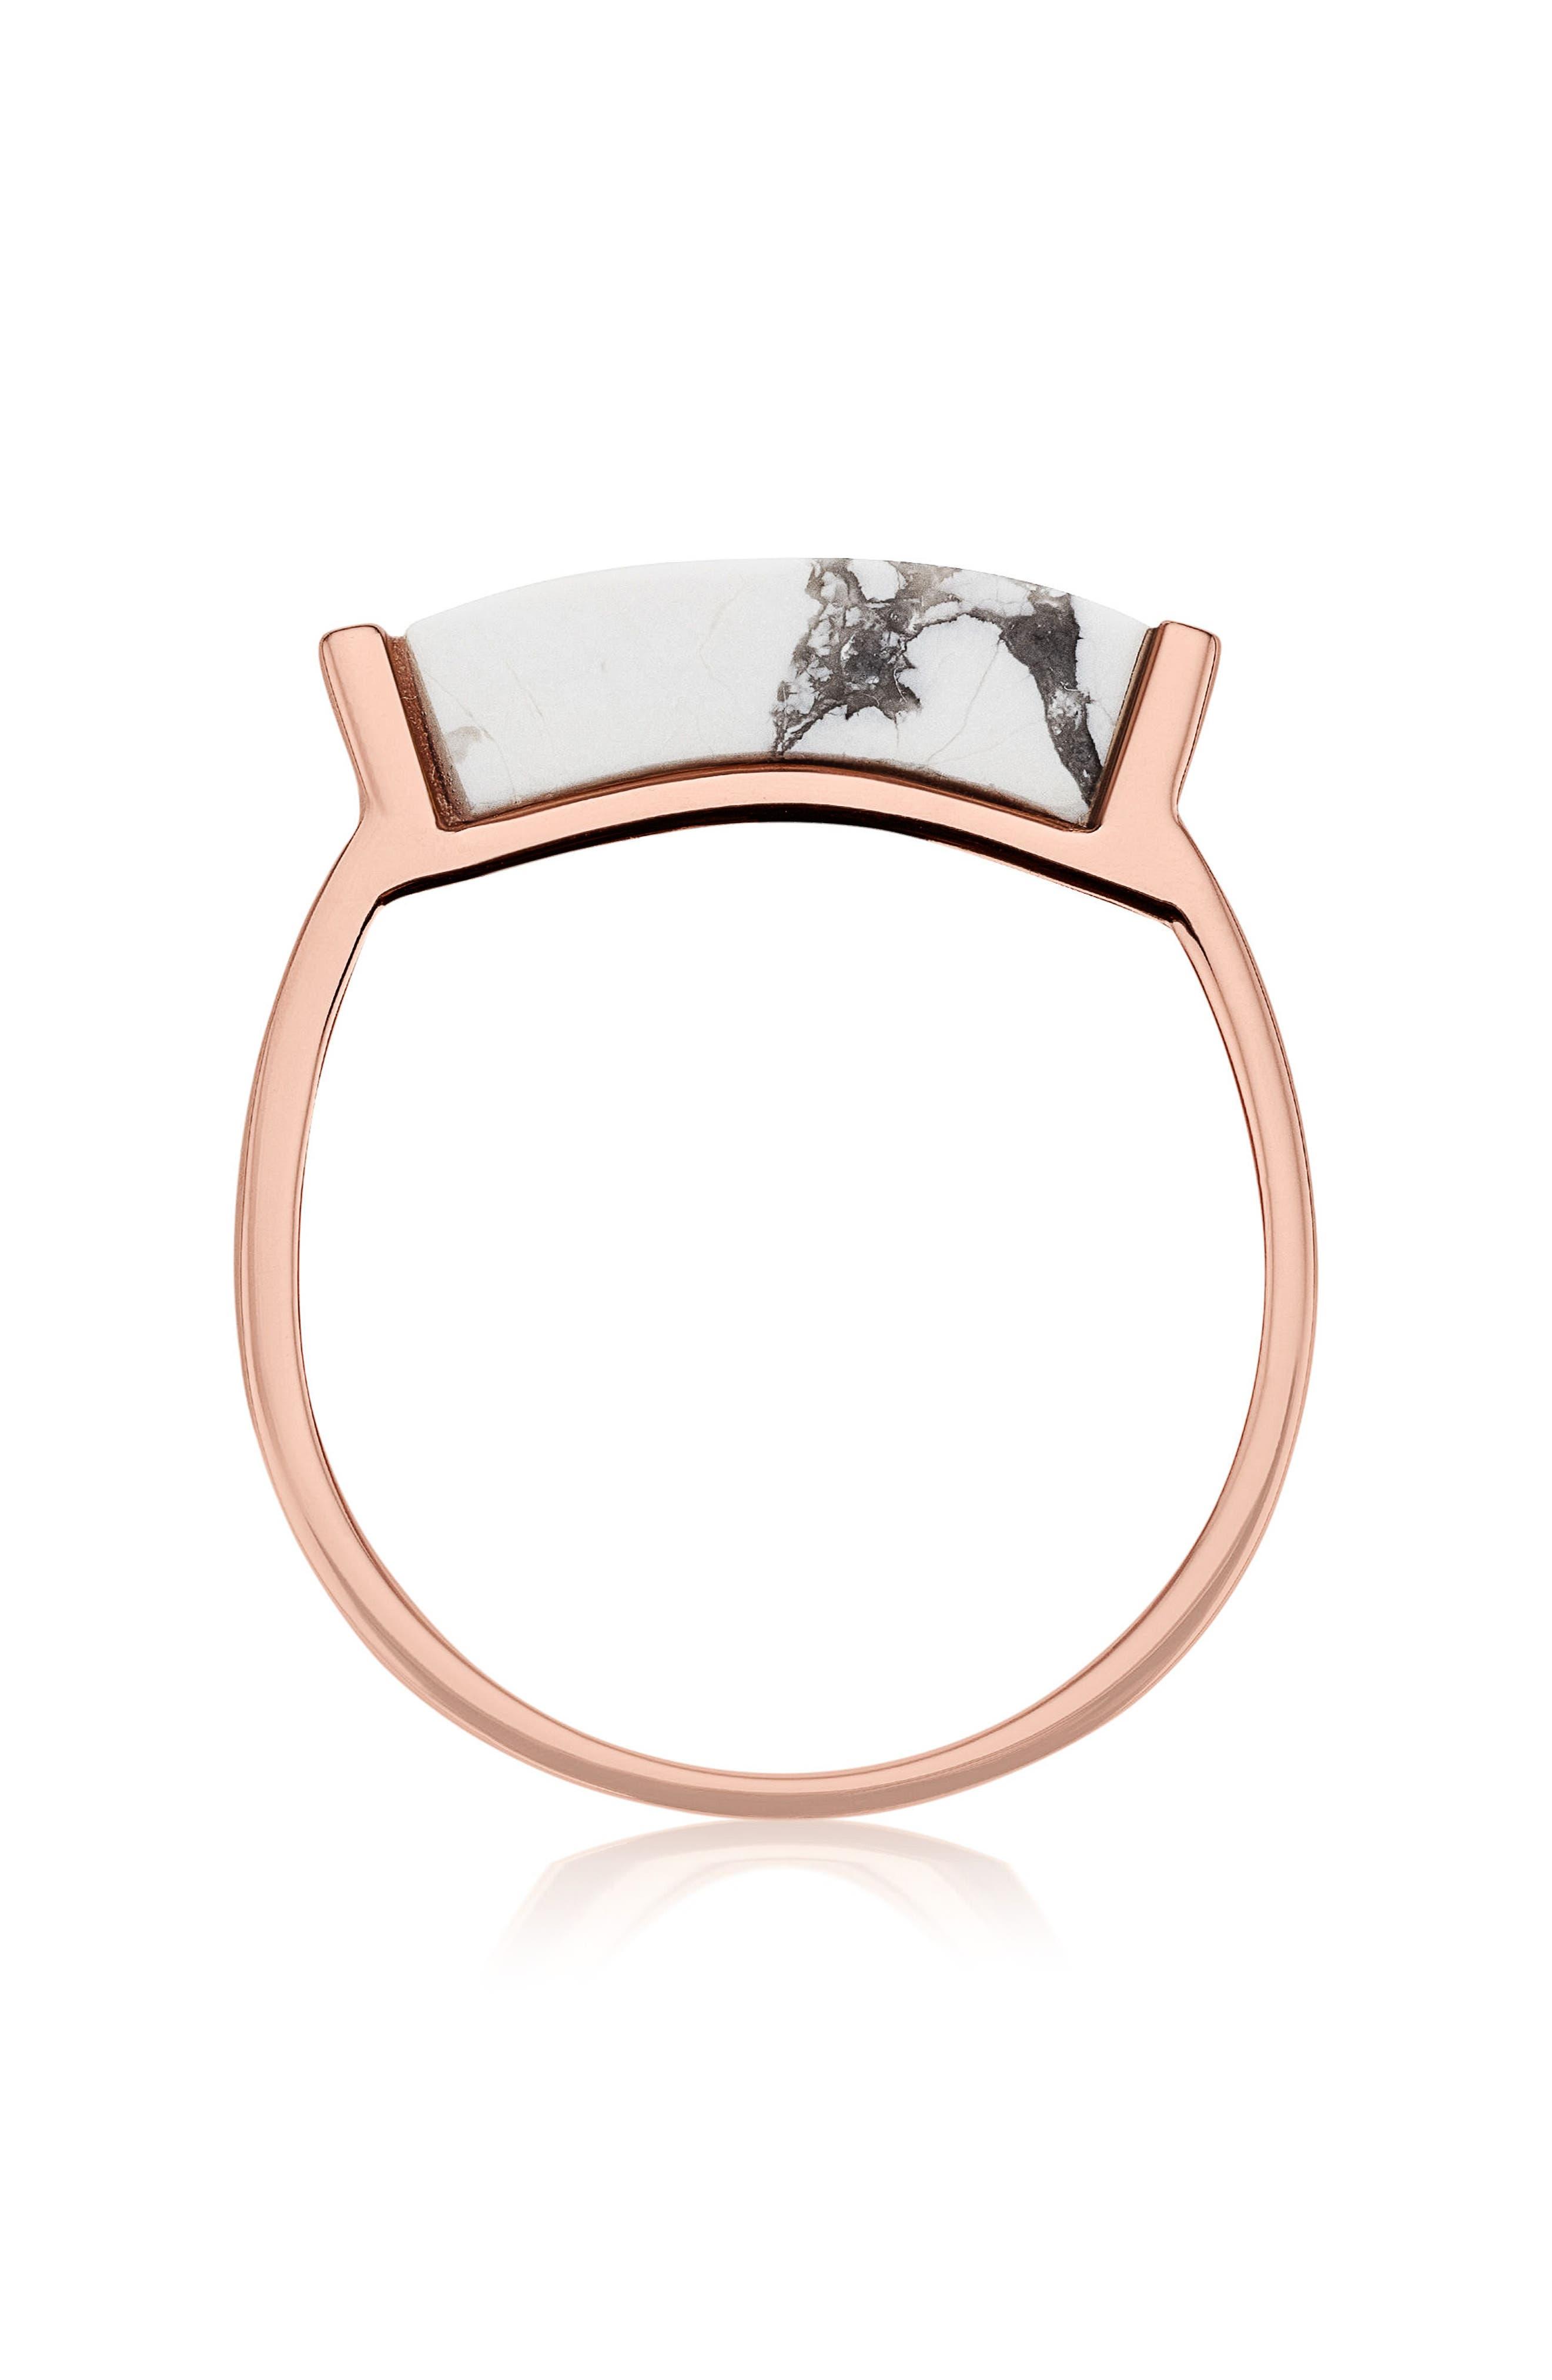 Engravable Linear Stone Ring,                             Alternate thumbnail 2, color,                             ROSE GOLD/ HOWLITE